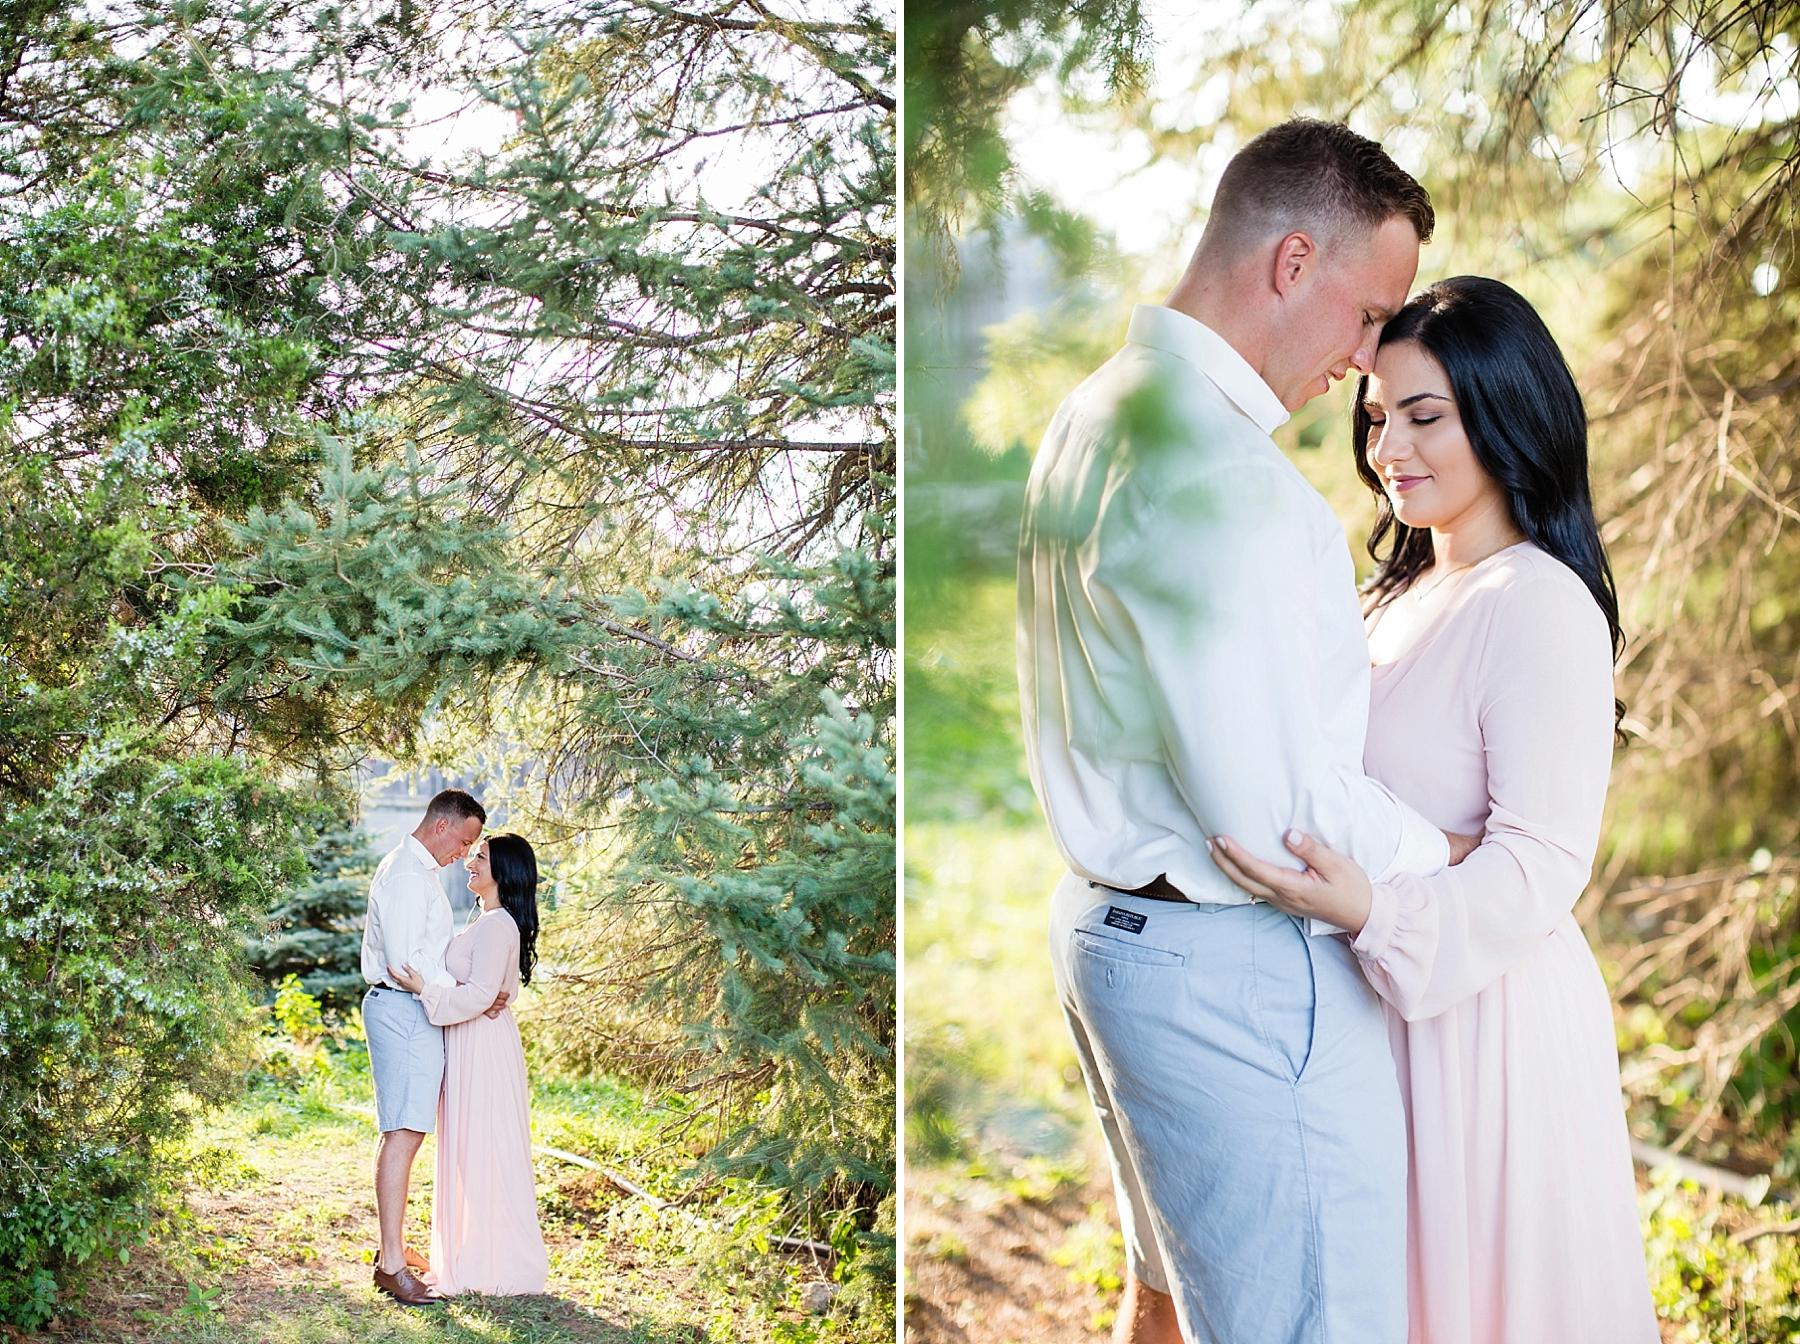 windsor-wedding-engagement-photographer-eryn-shea-photography-field-of-flowers_0001.jpg